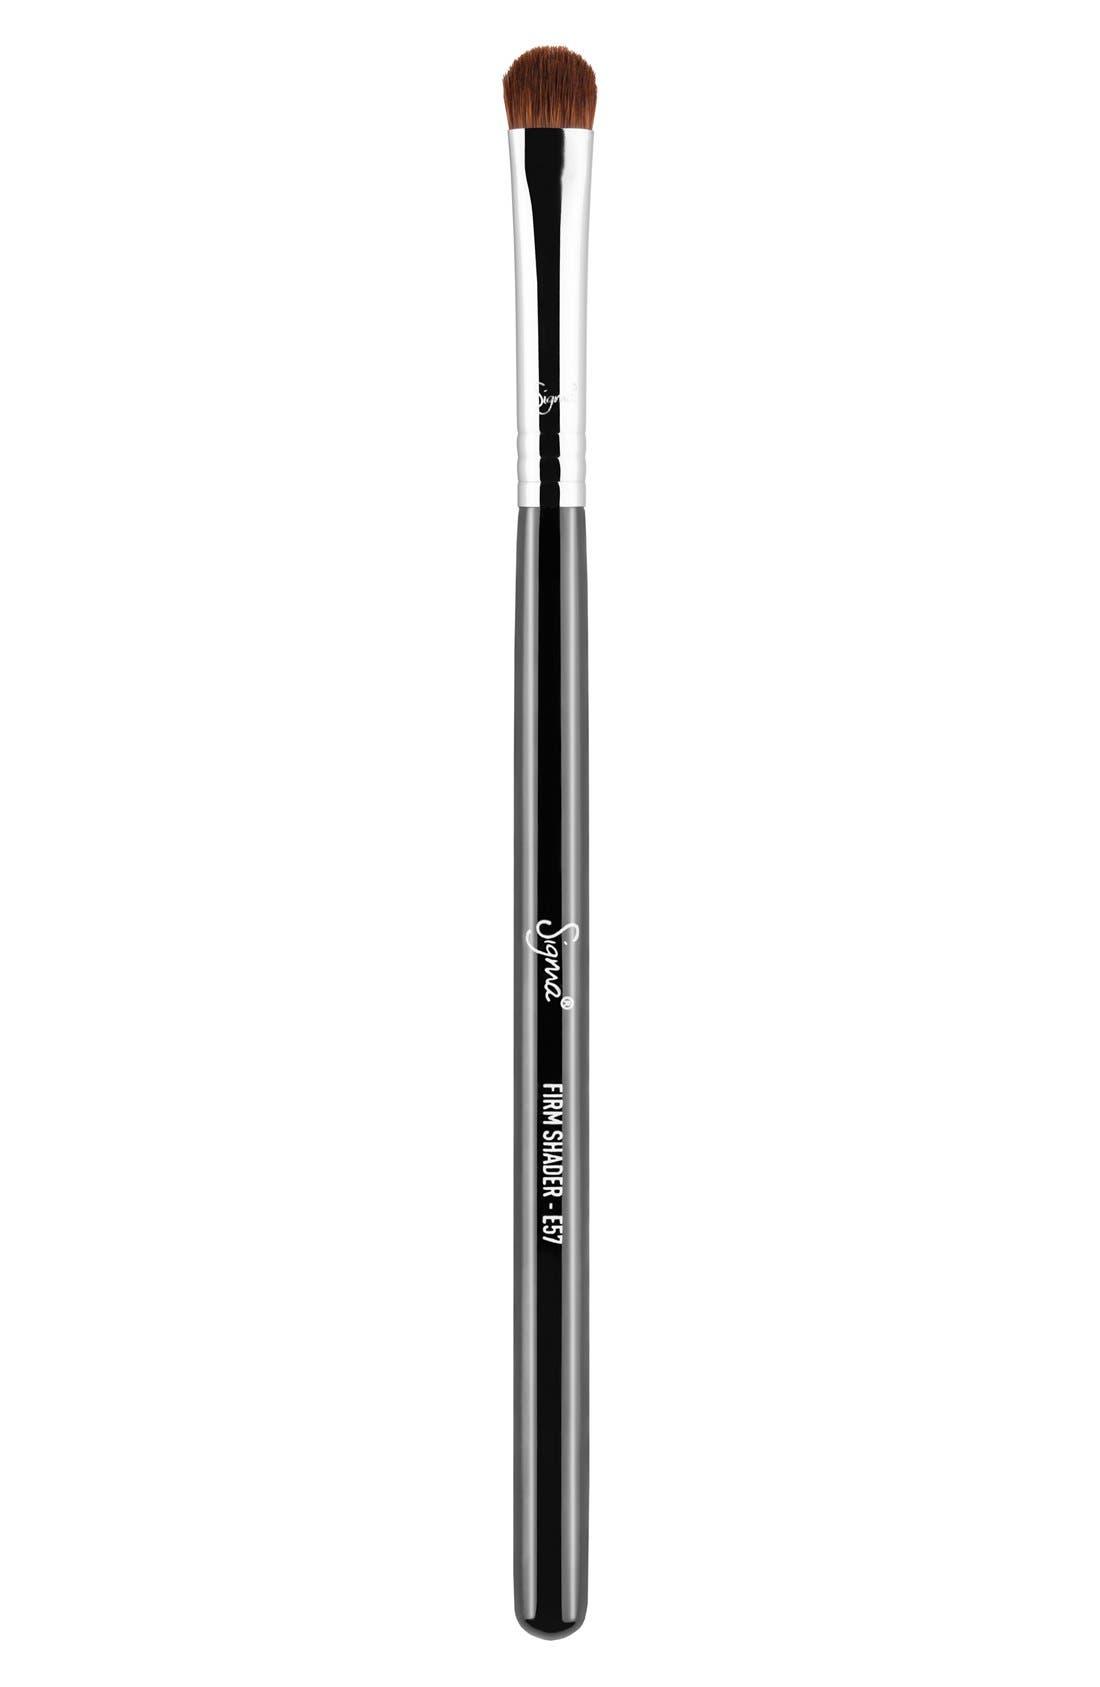 E57 Firm Shader Brush,                         Main,                         color, NO COLOR